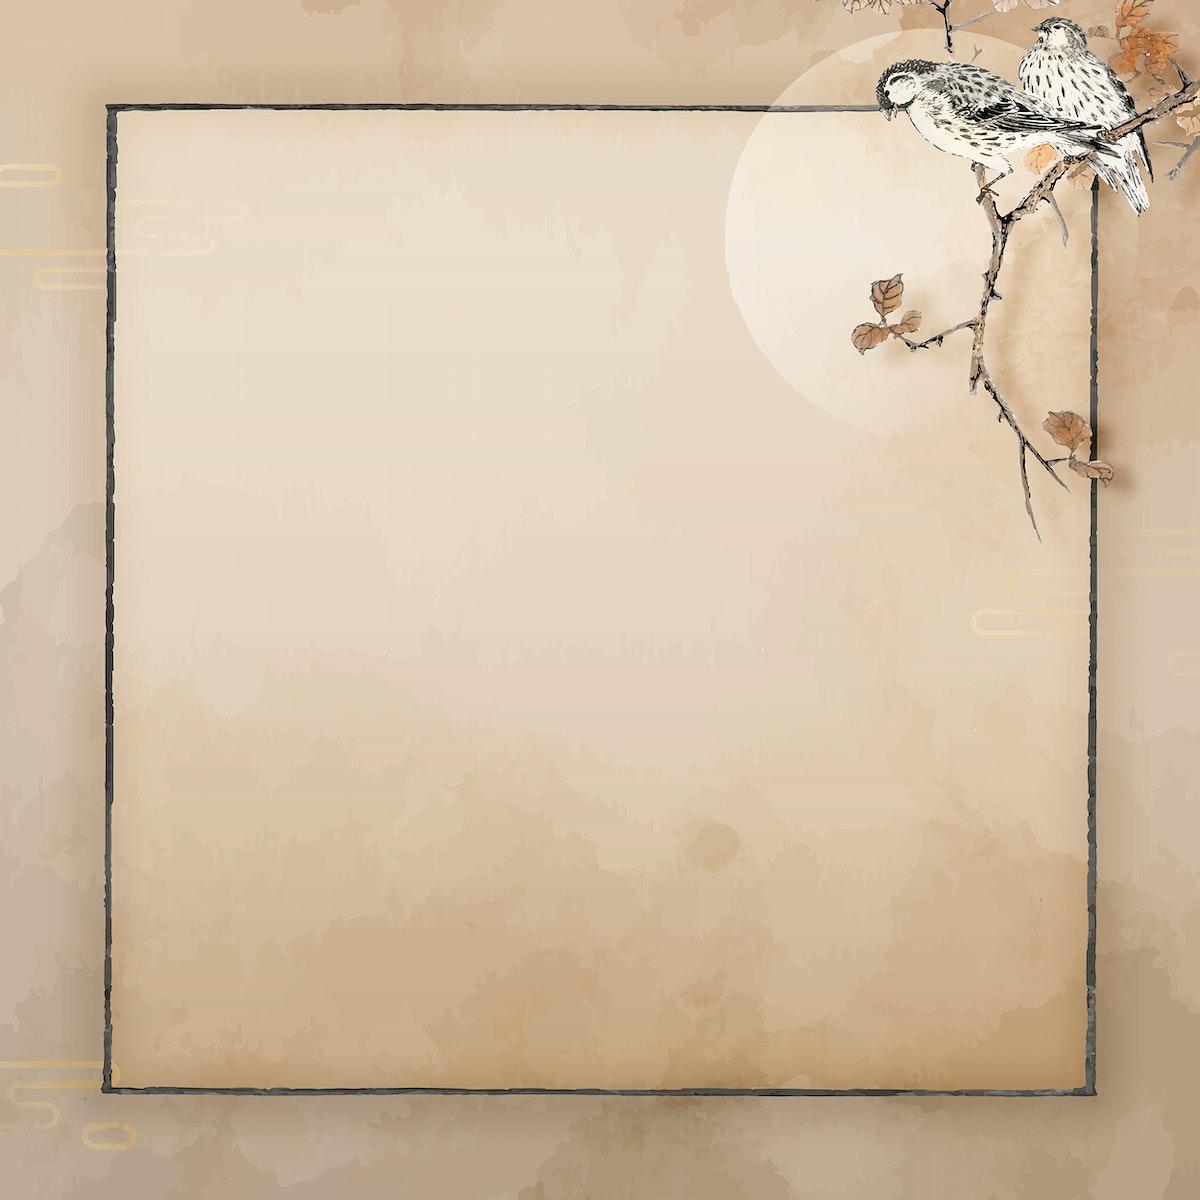 Blank square bird frame vector